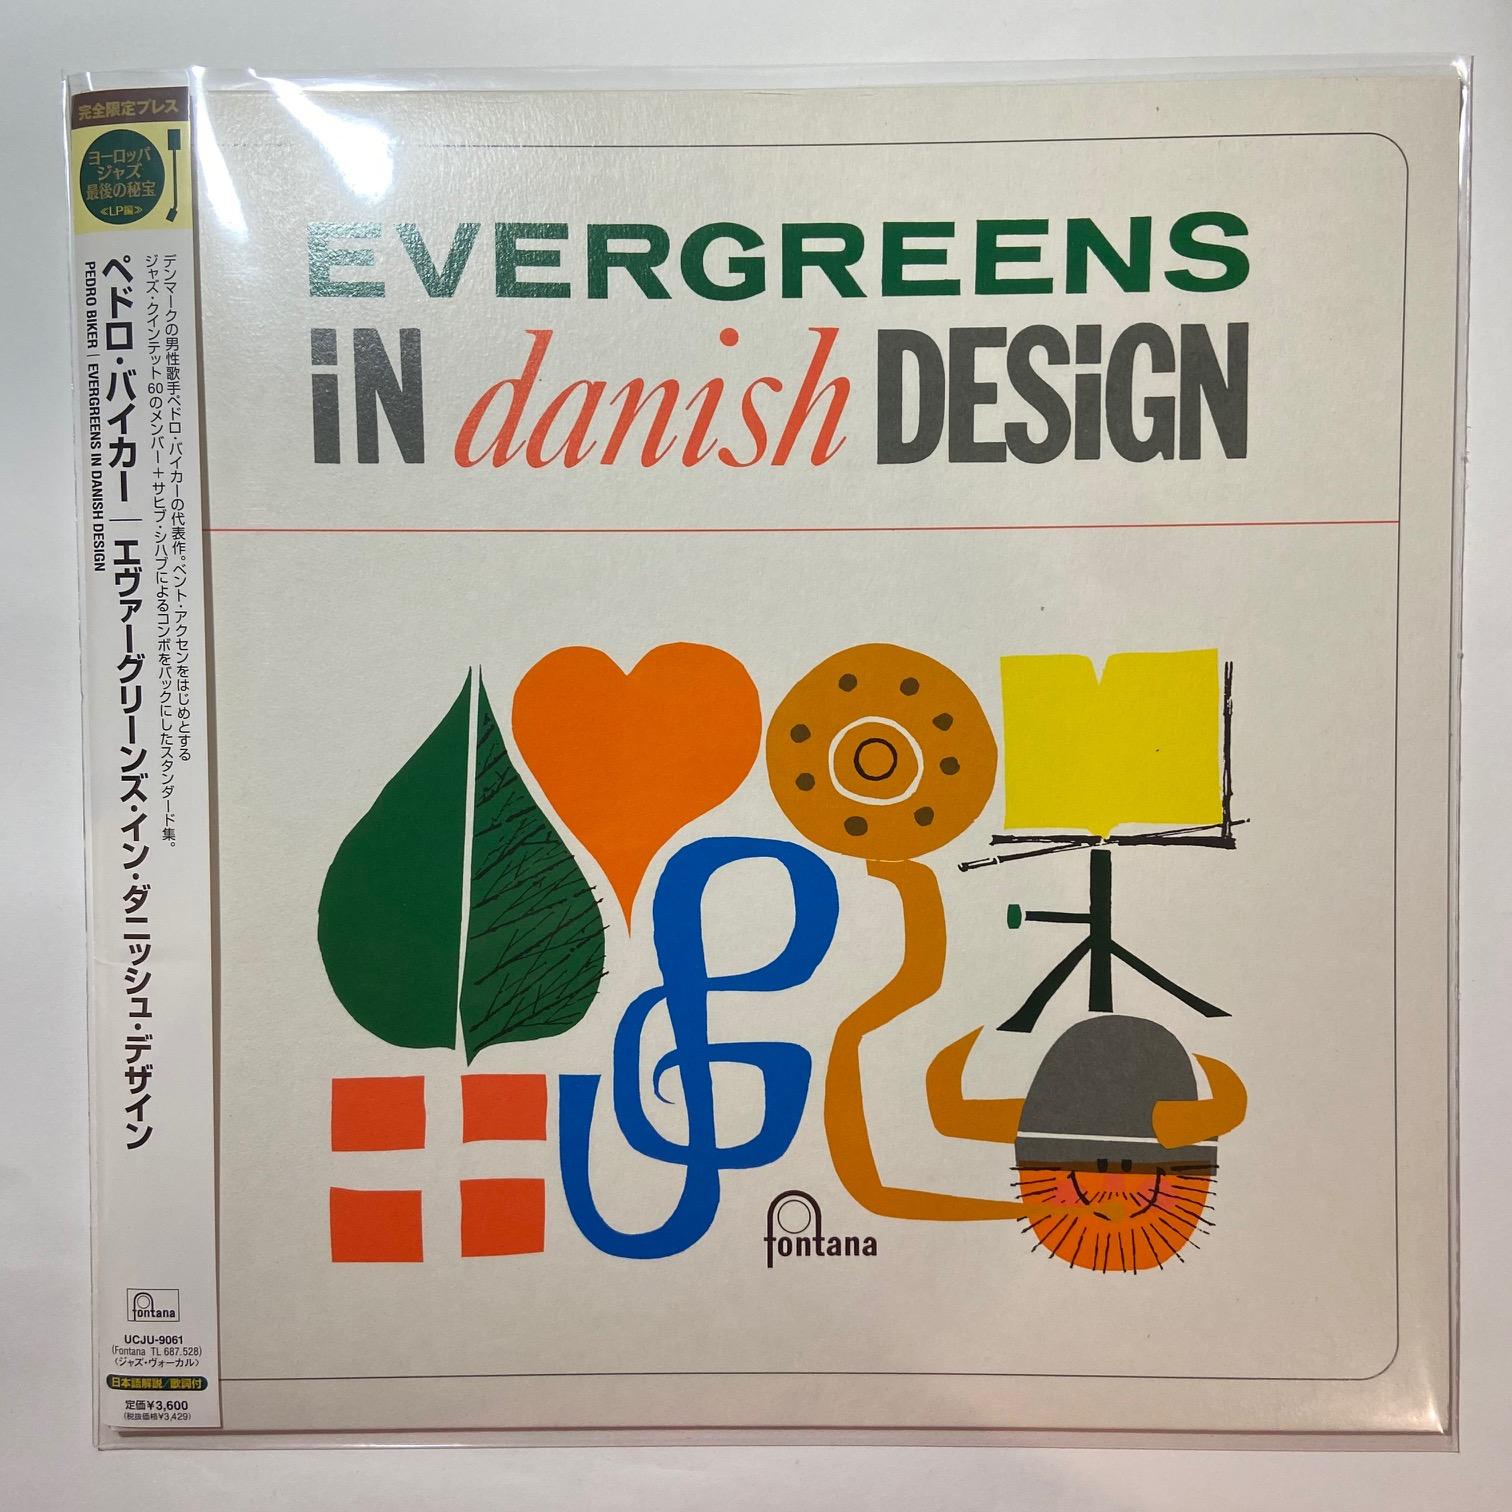 PEDRO BIKER - Evergreens In Danish Design - LP